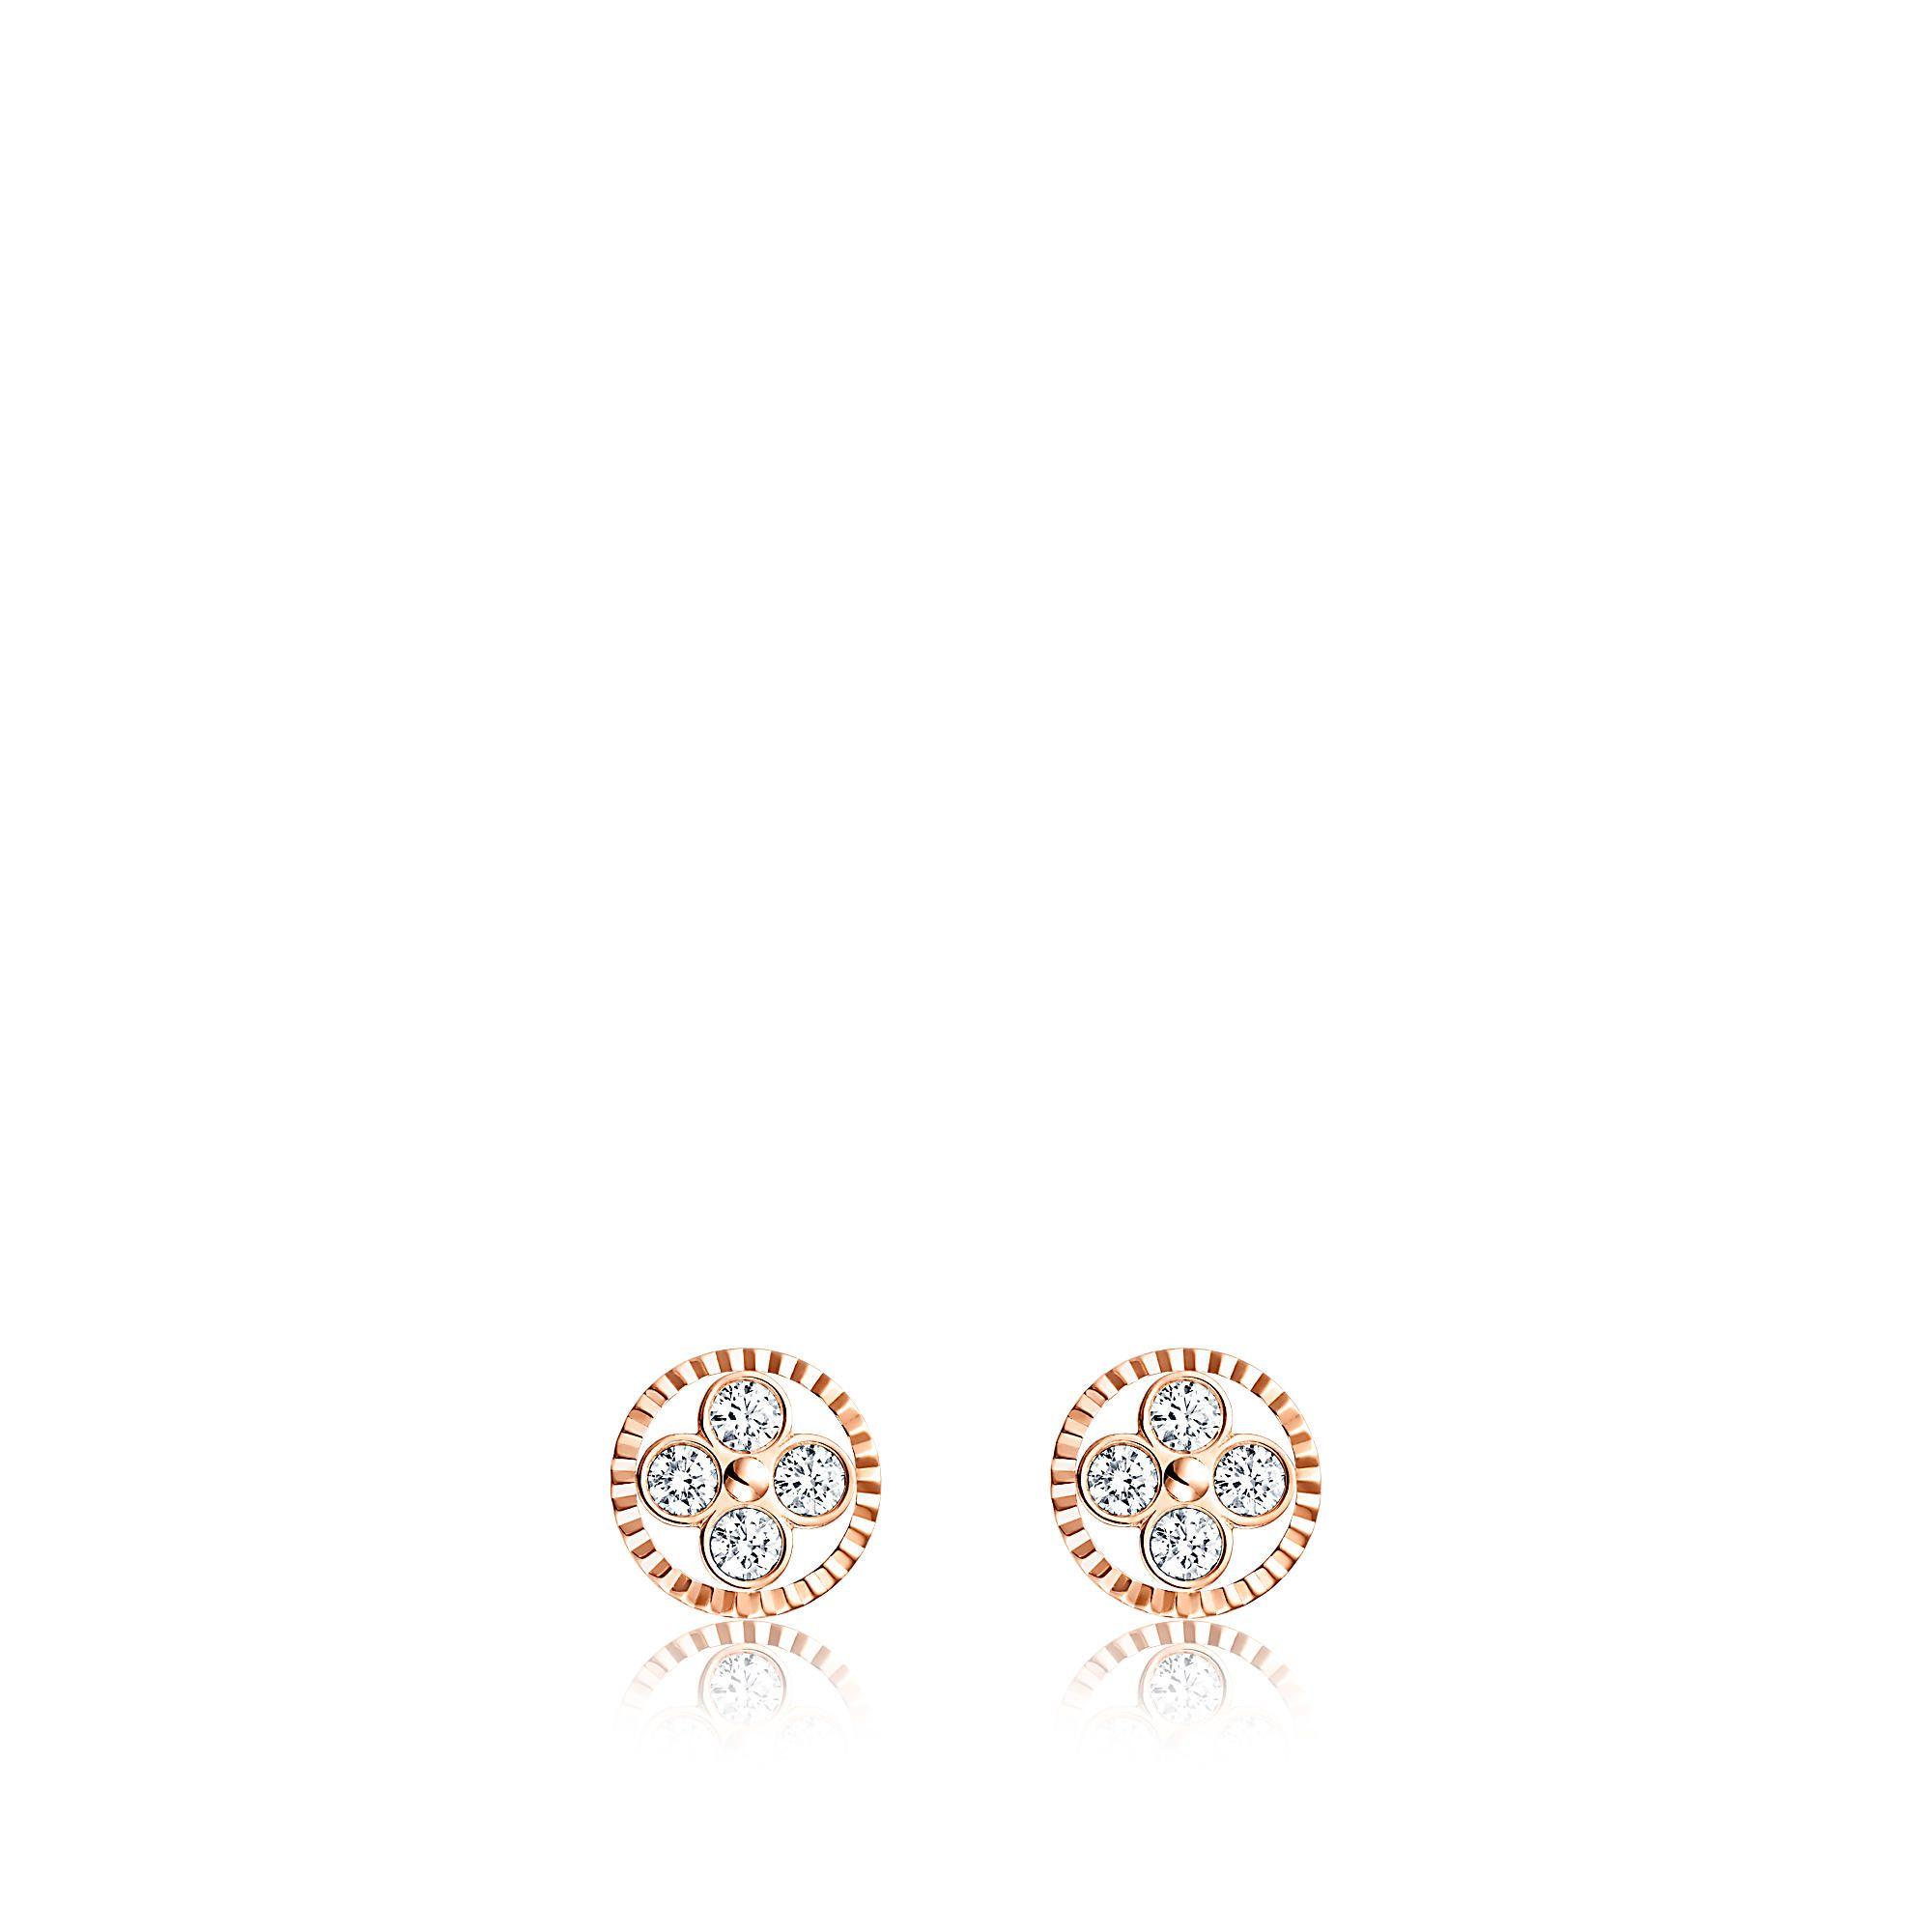 3b39252a857c Resultado de imagen para studs jewellery. Ear StudsBlossomsEarsLouis Vuitton BbDiamondsPinkGoldProducts